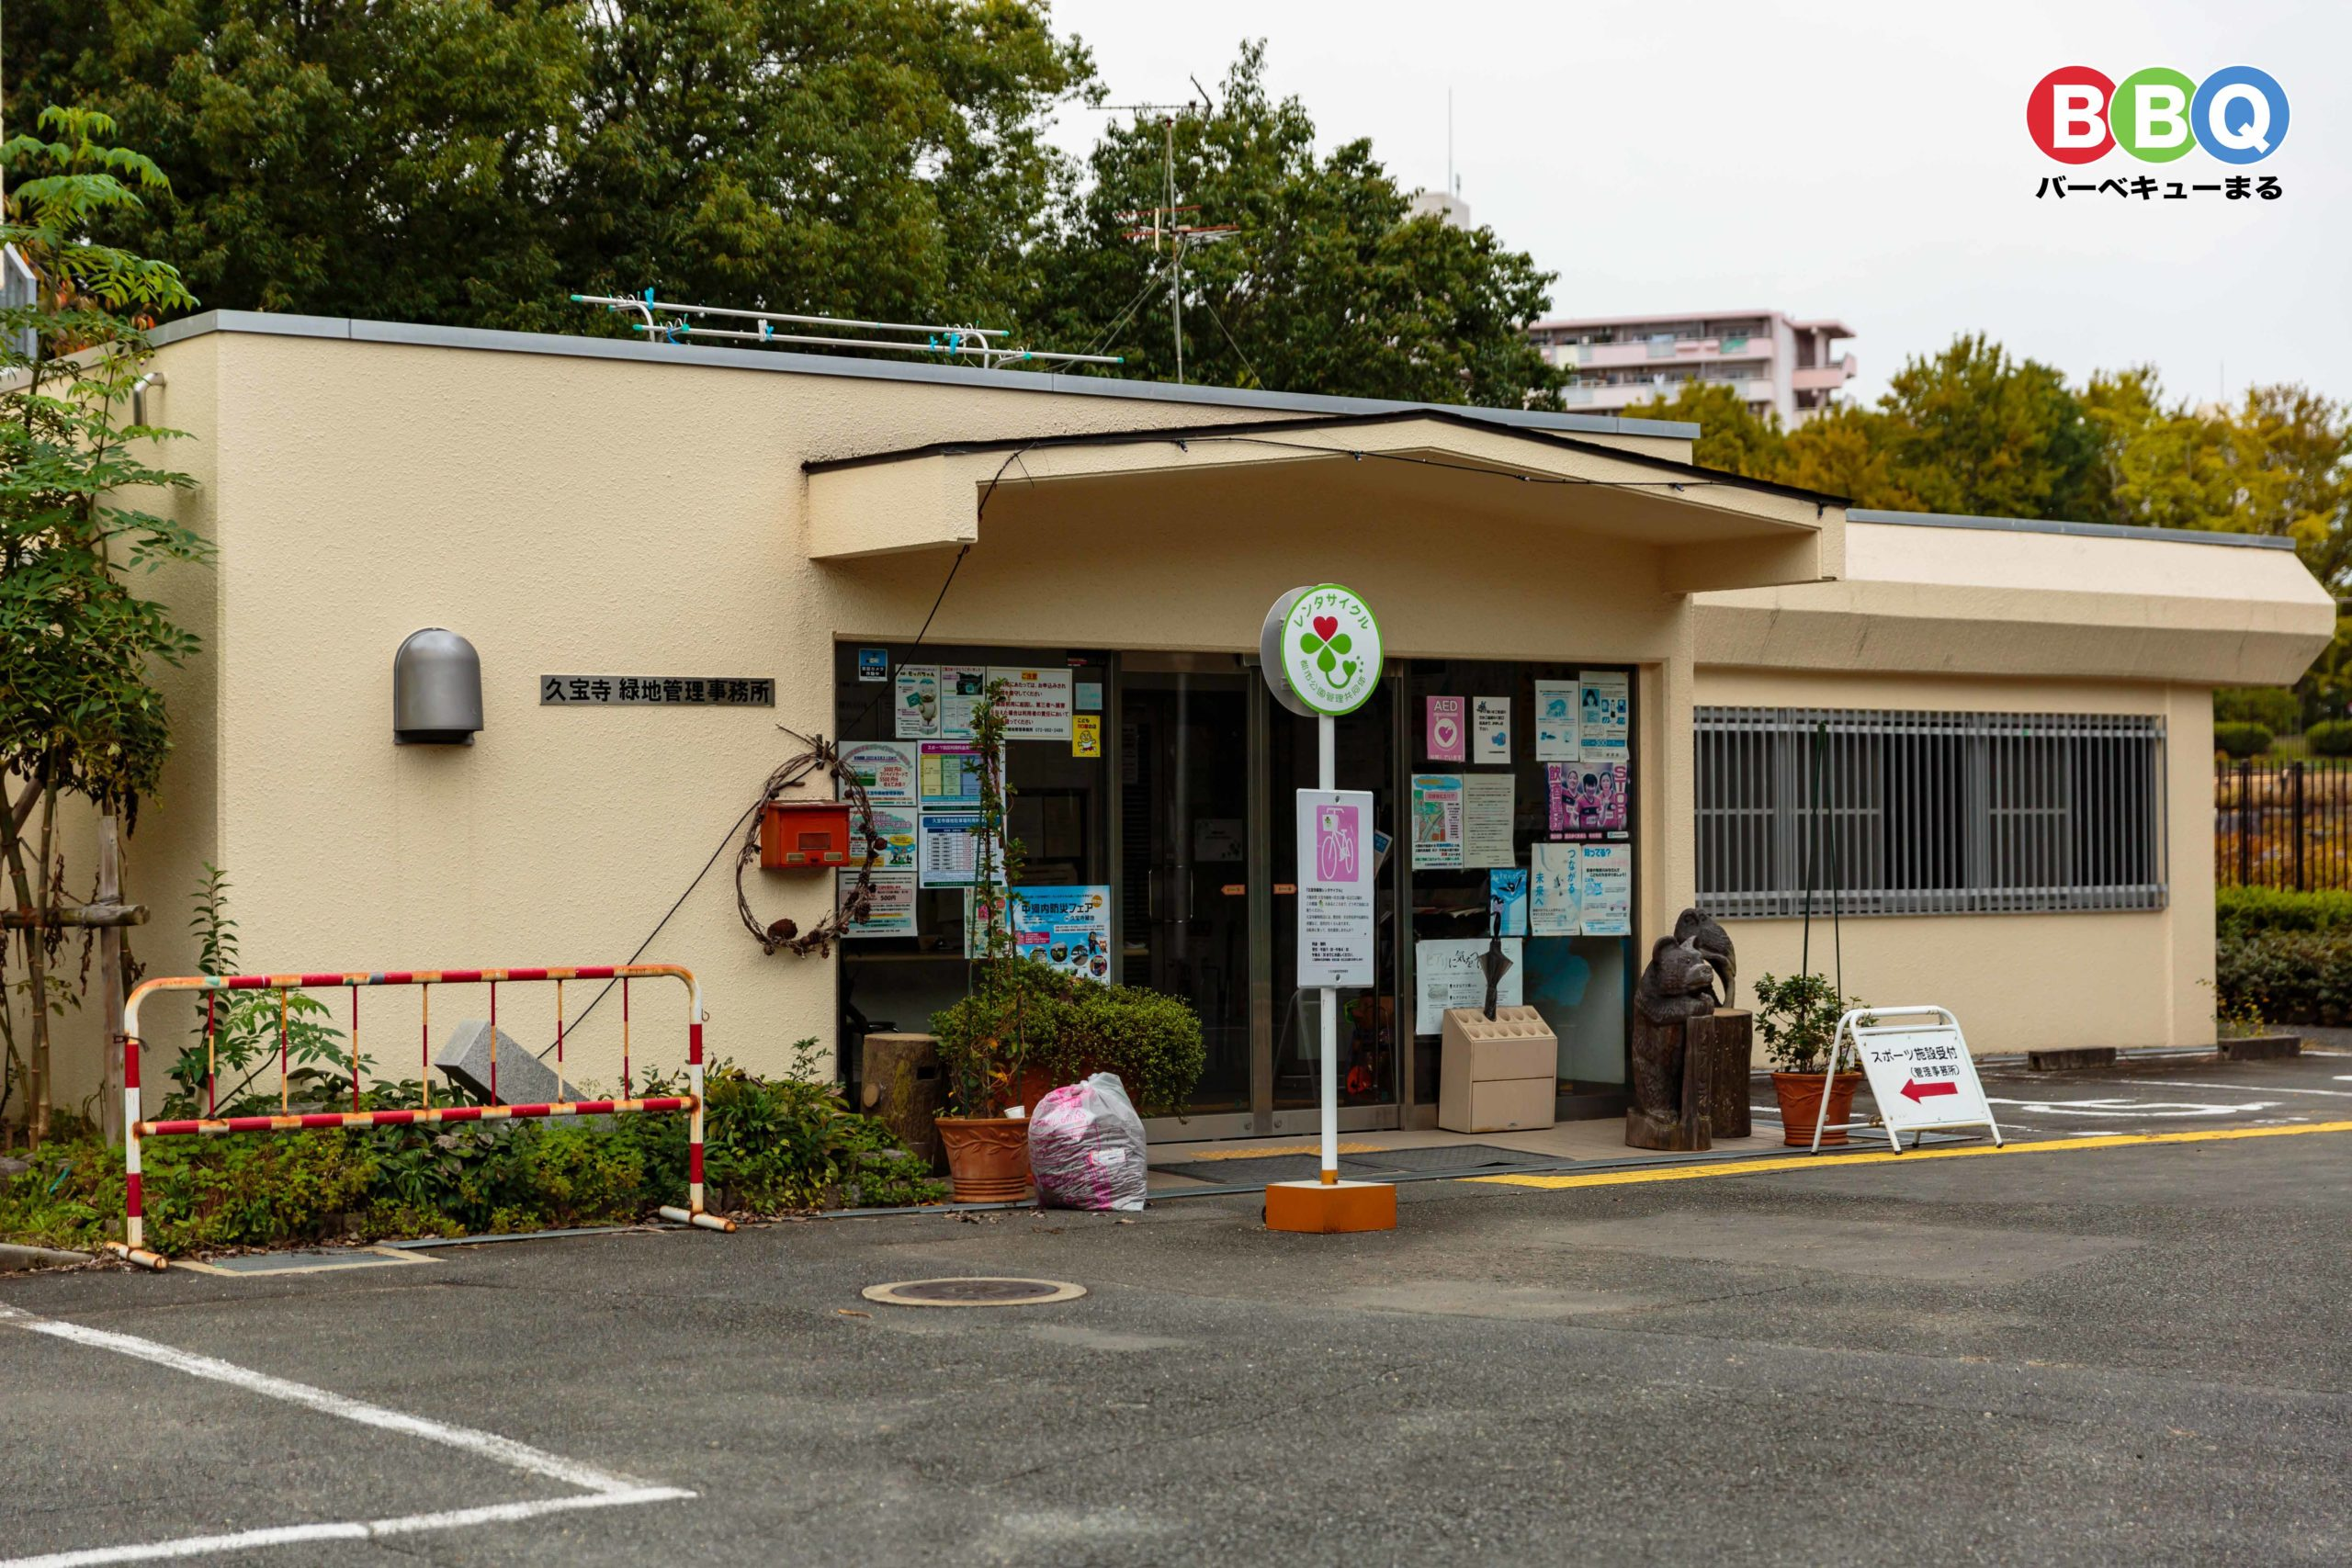 久宝寺緑地公園の管理事務所